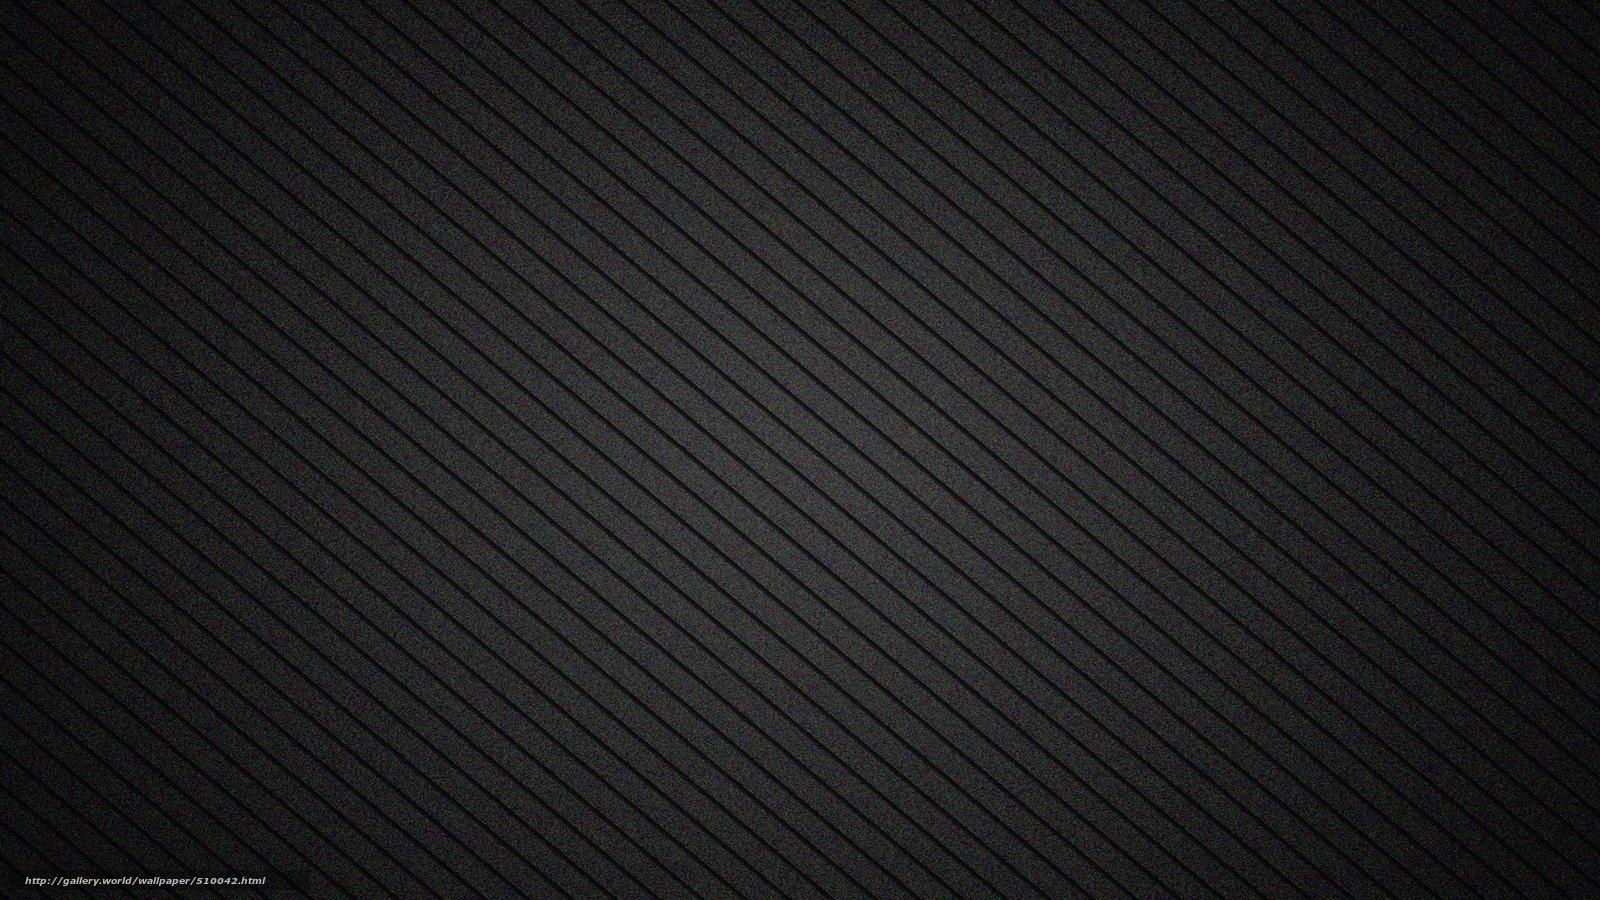 baixar wallpaper fundo preto - photo #4